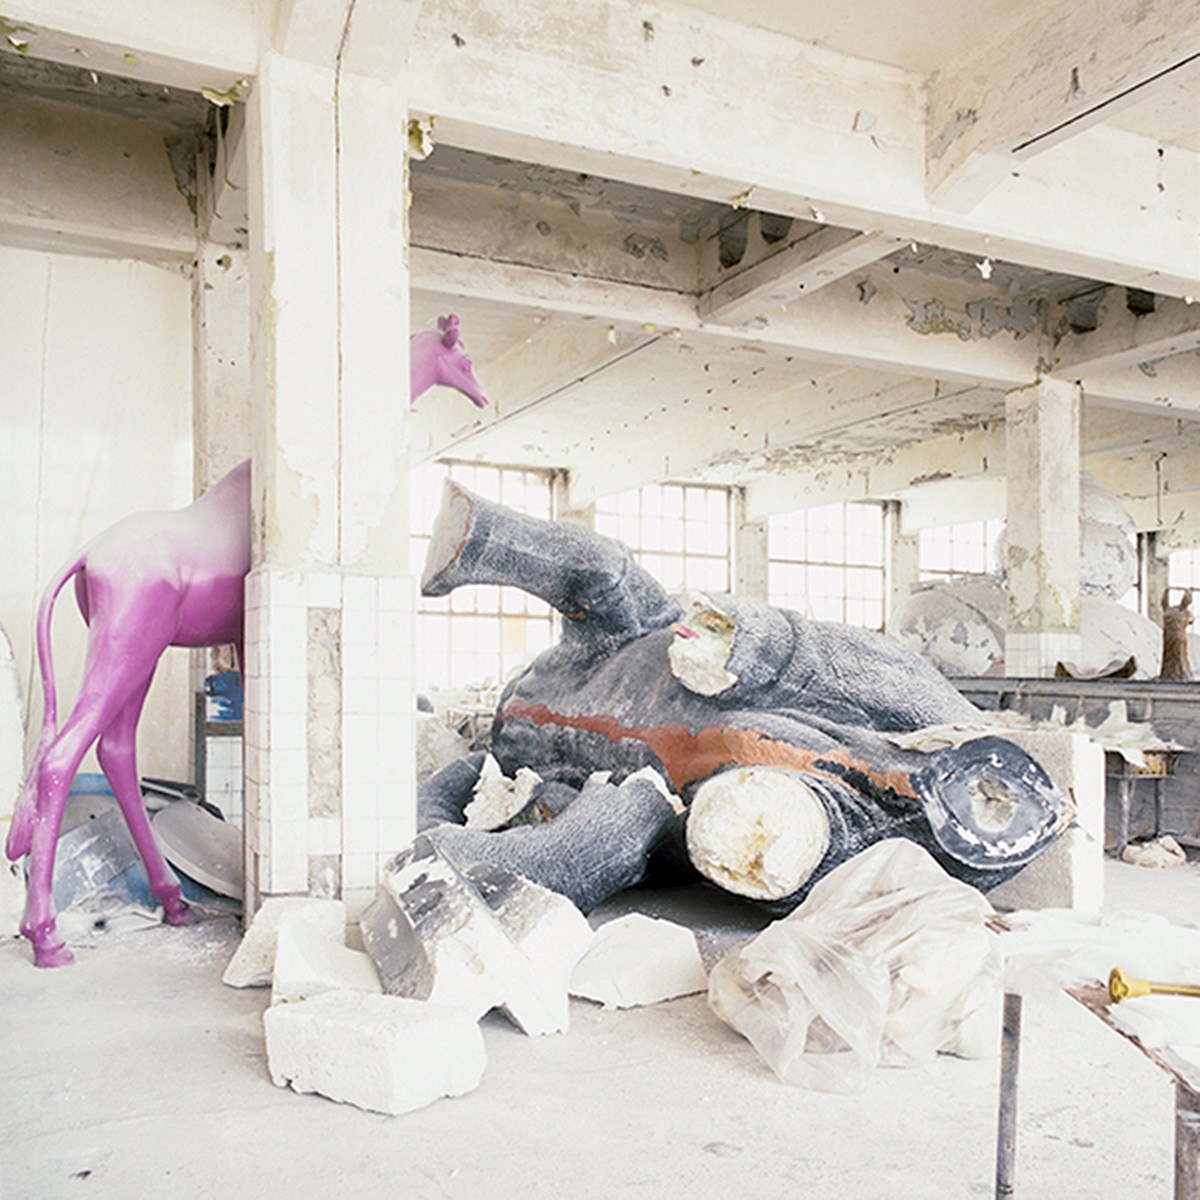 Anna Lehmann-Brauns -- Paradise Lost